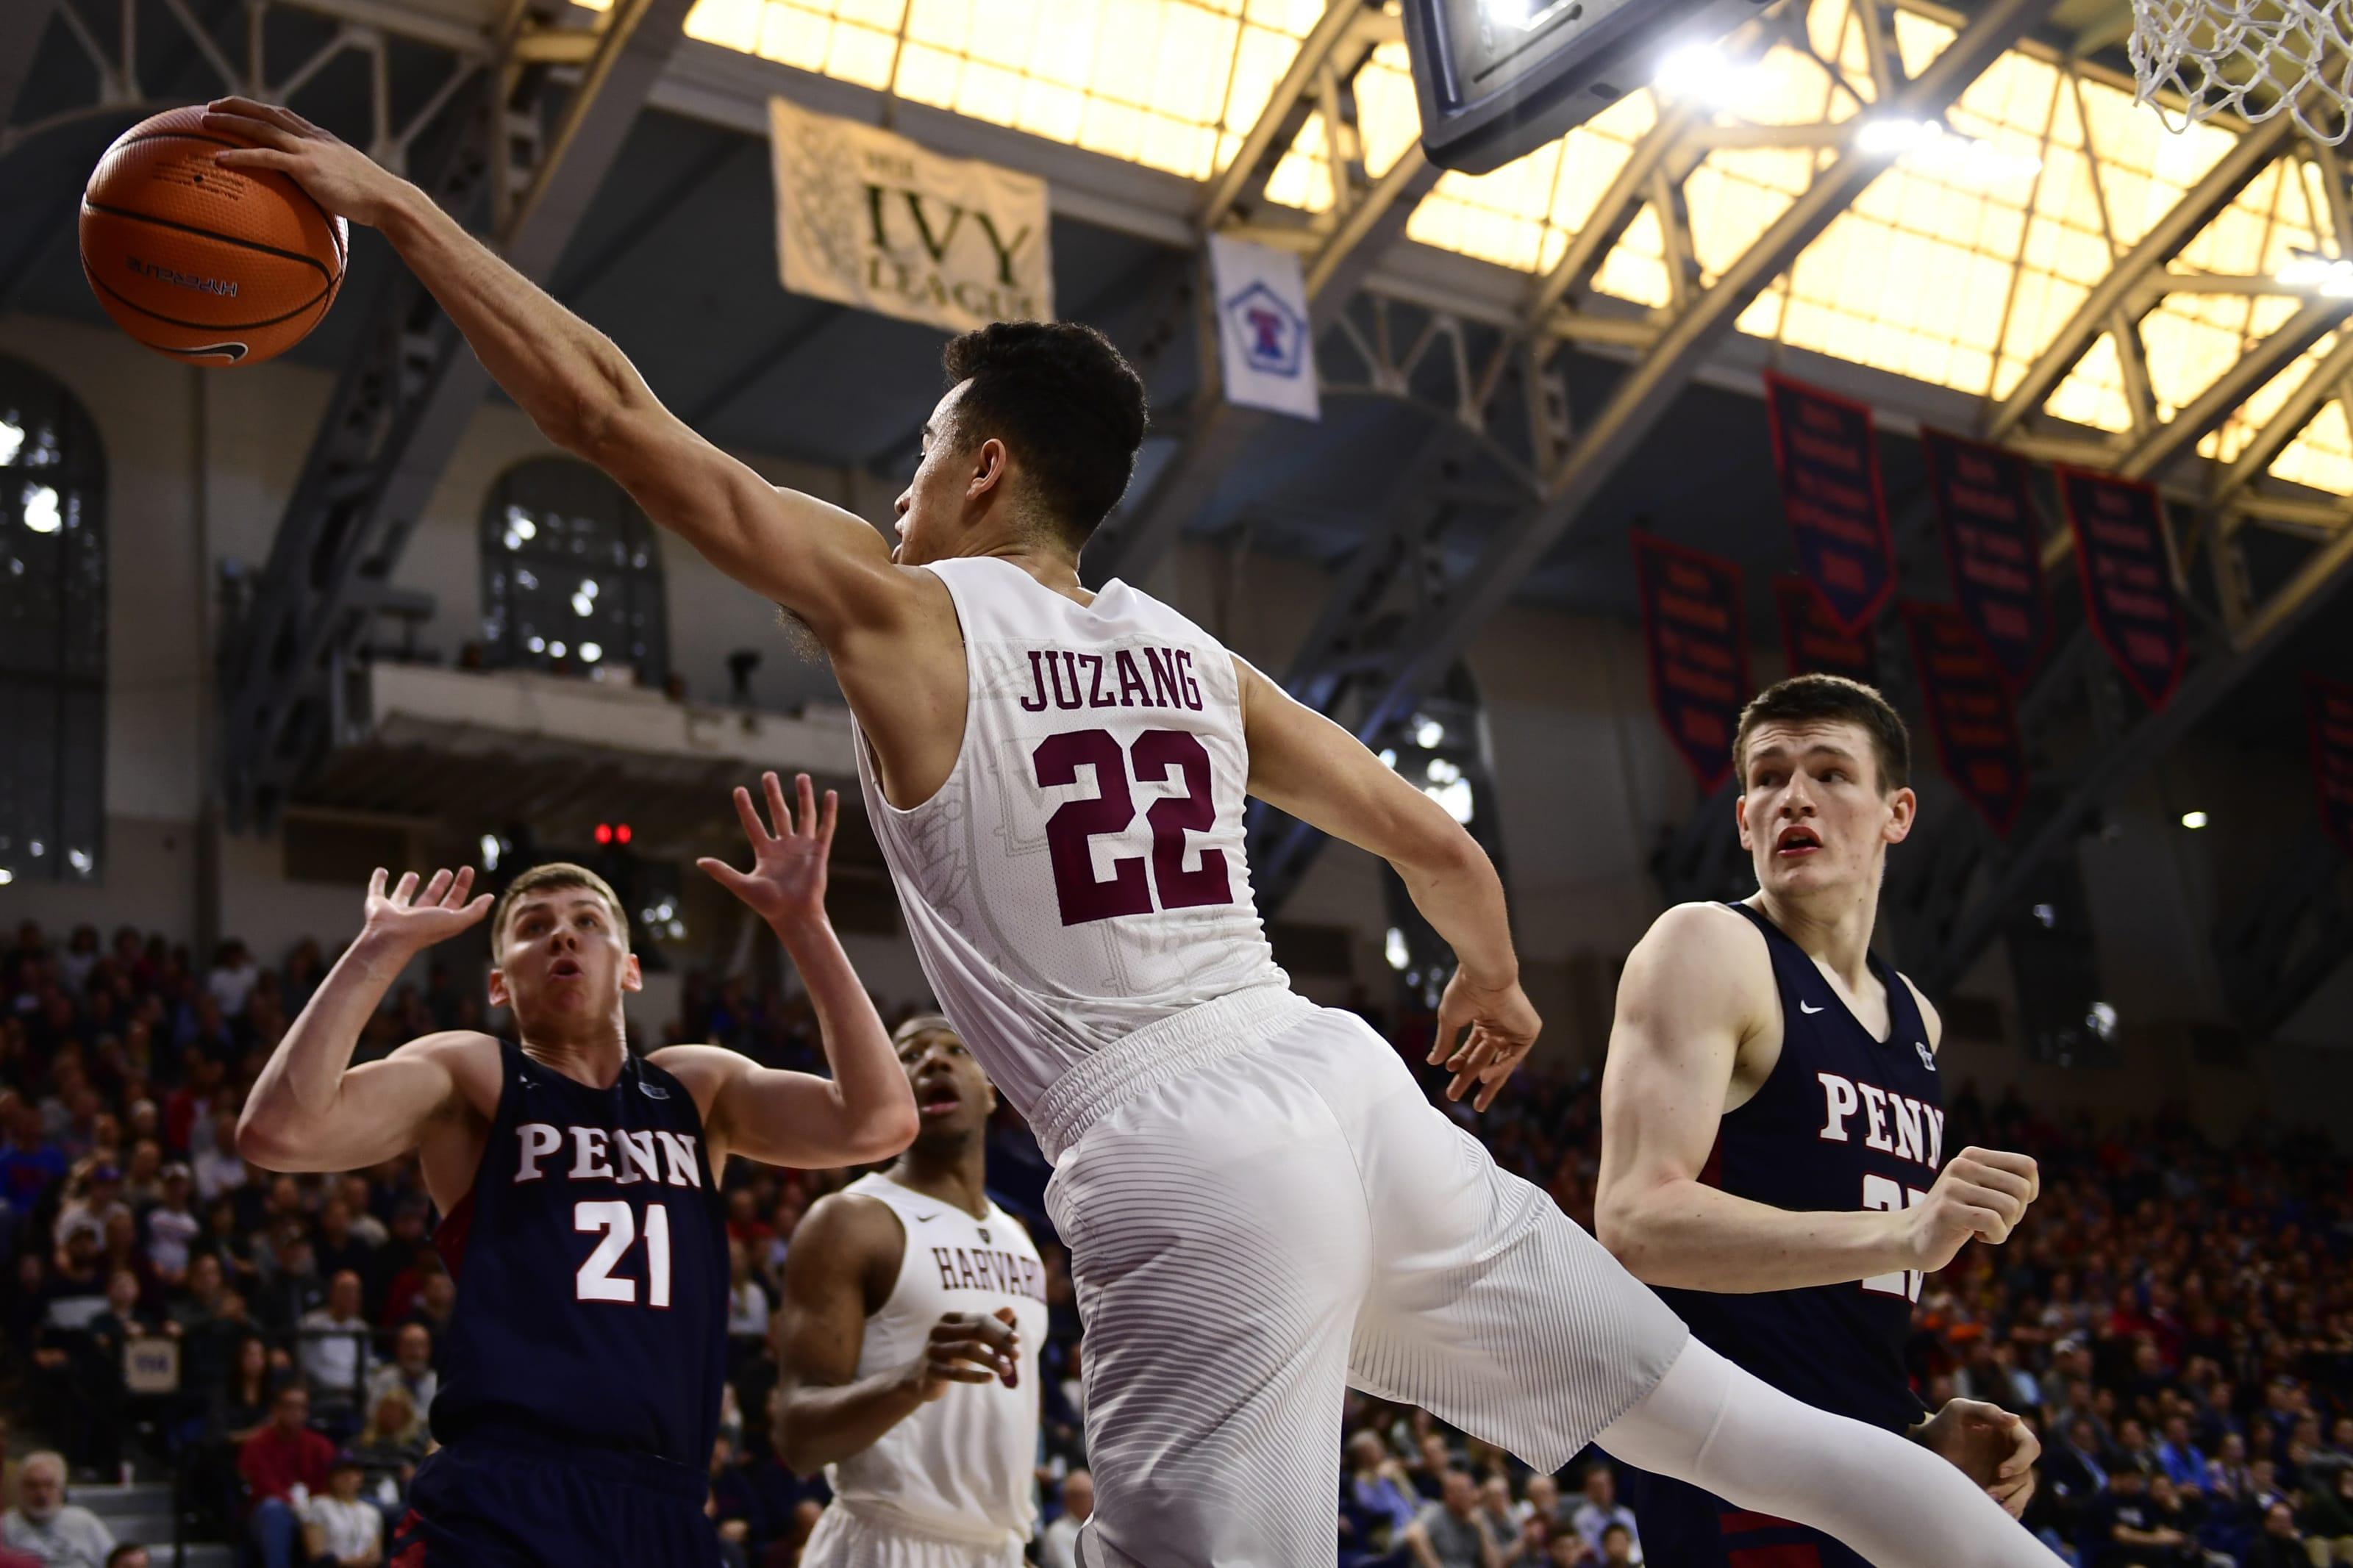 Ivy League Basketball